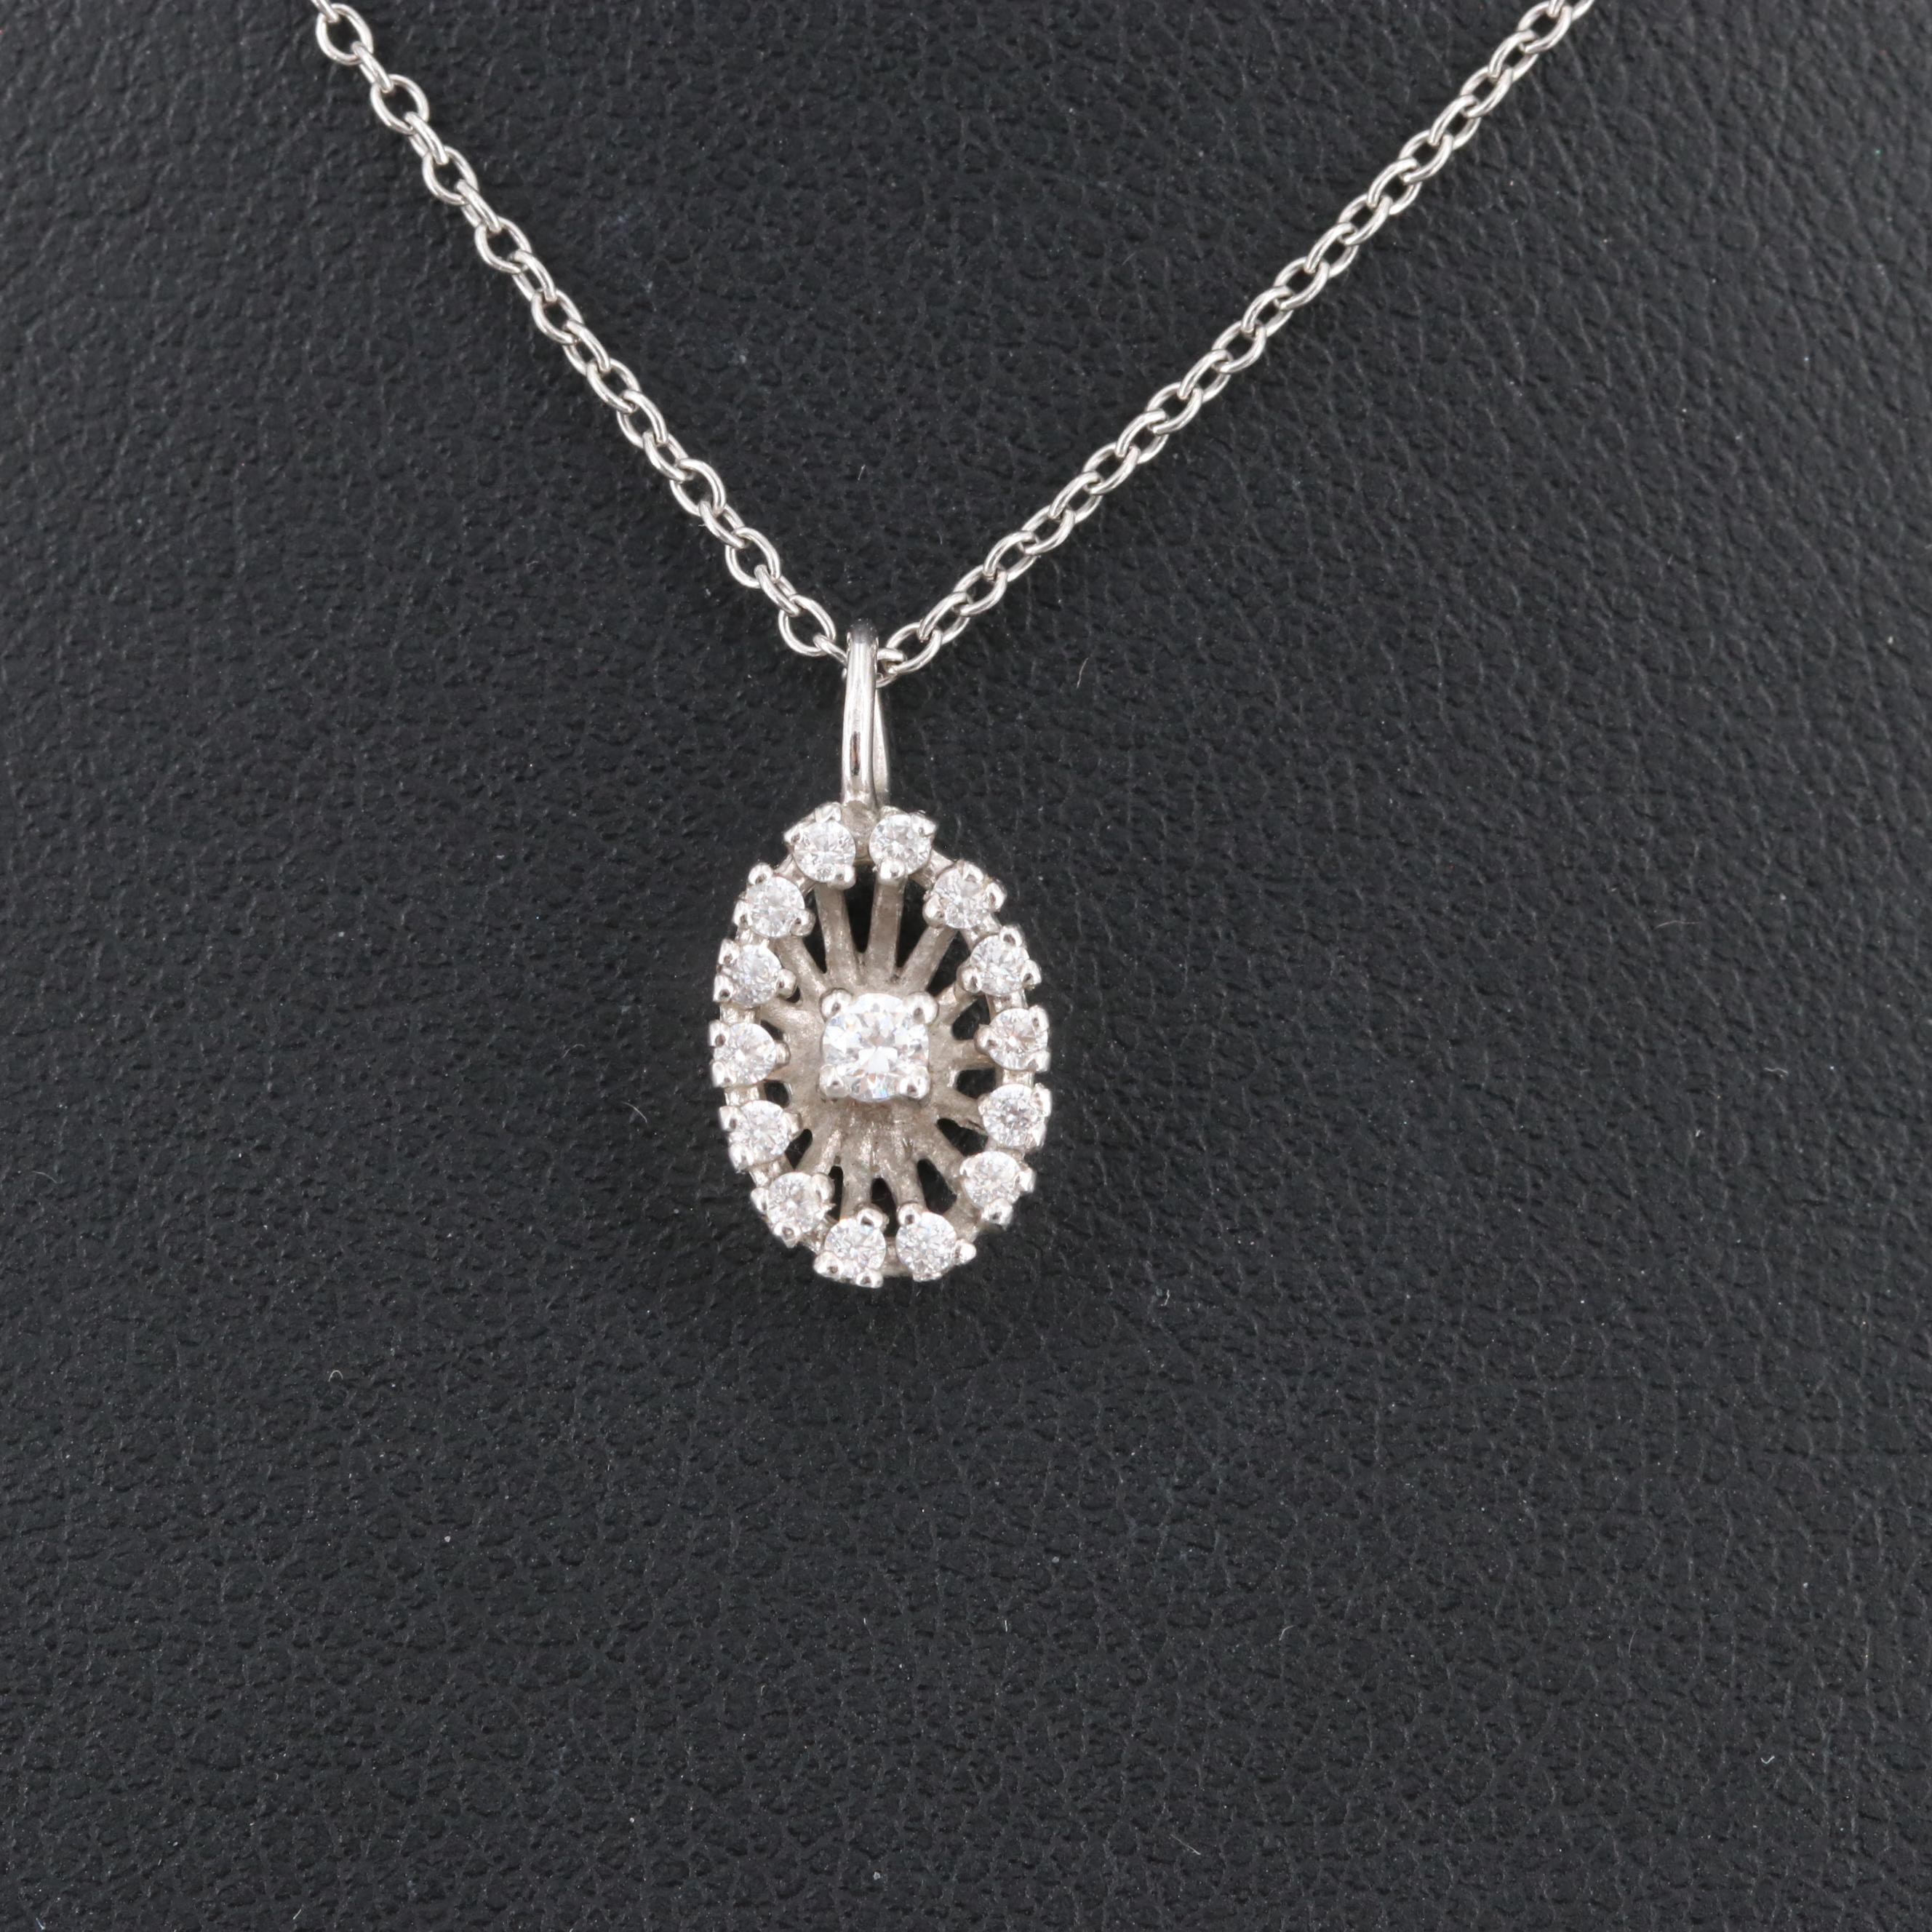 18K White Gold Cubic Zirconia Pendant on Platinum Necklace